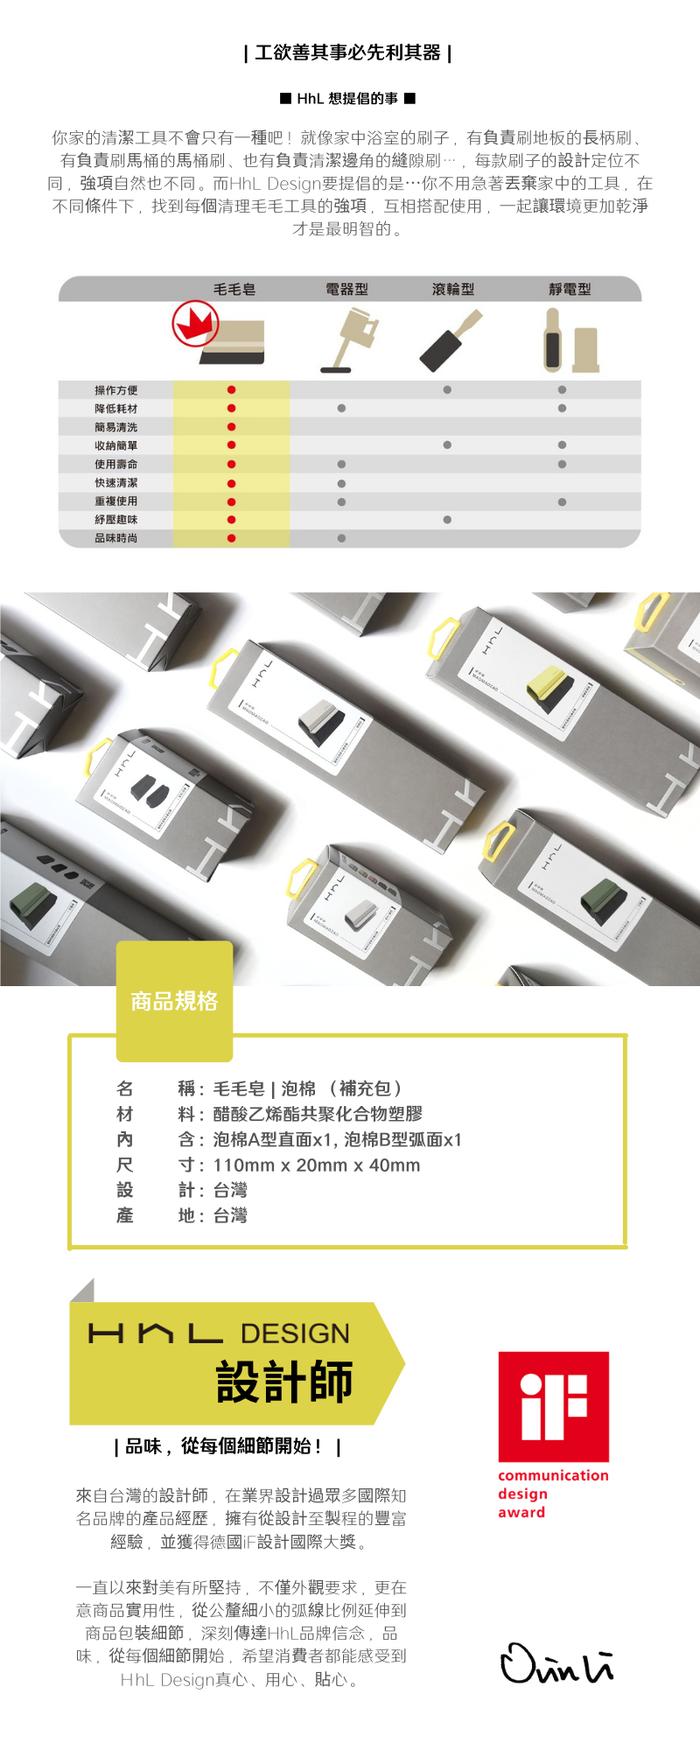 HhL Design | 毛毛皂-泡棉補充包(配件)